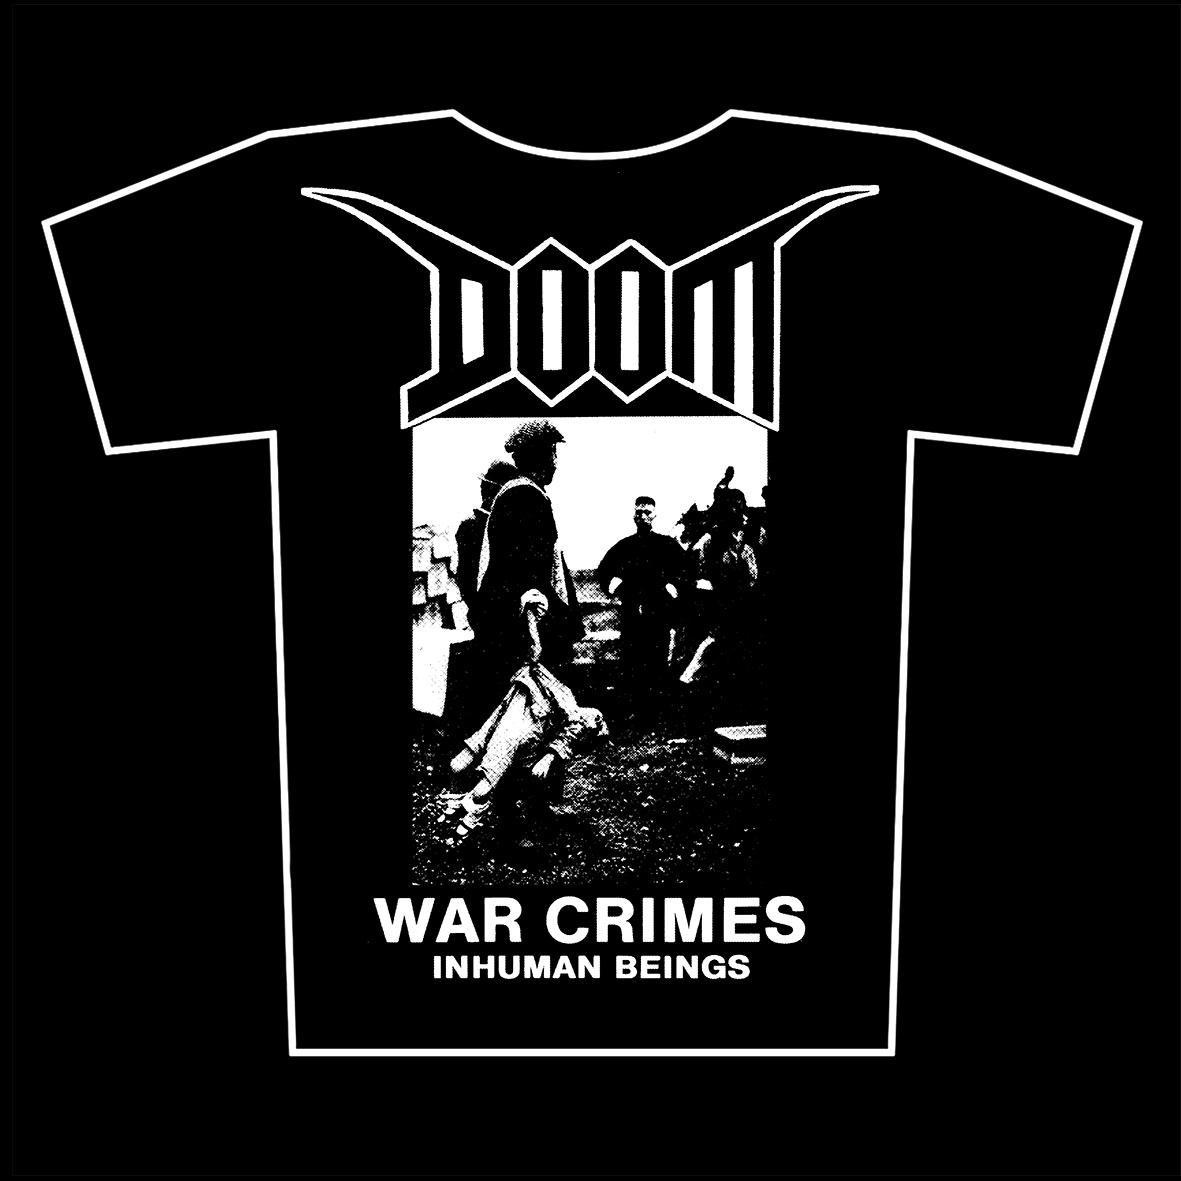 DOOM – War Crimes – t-shirts available again